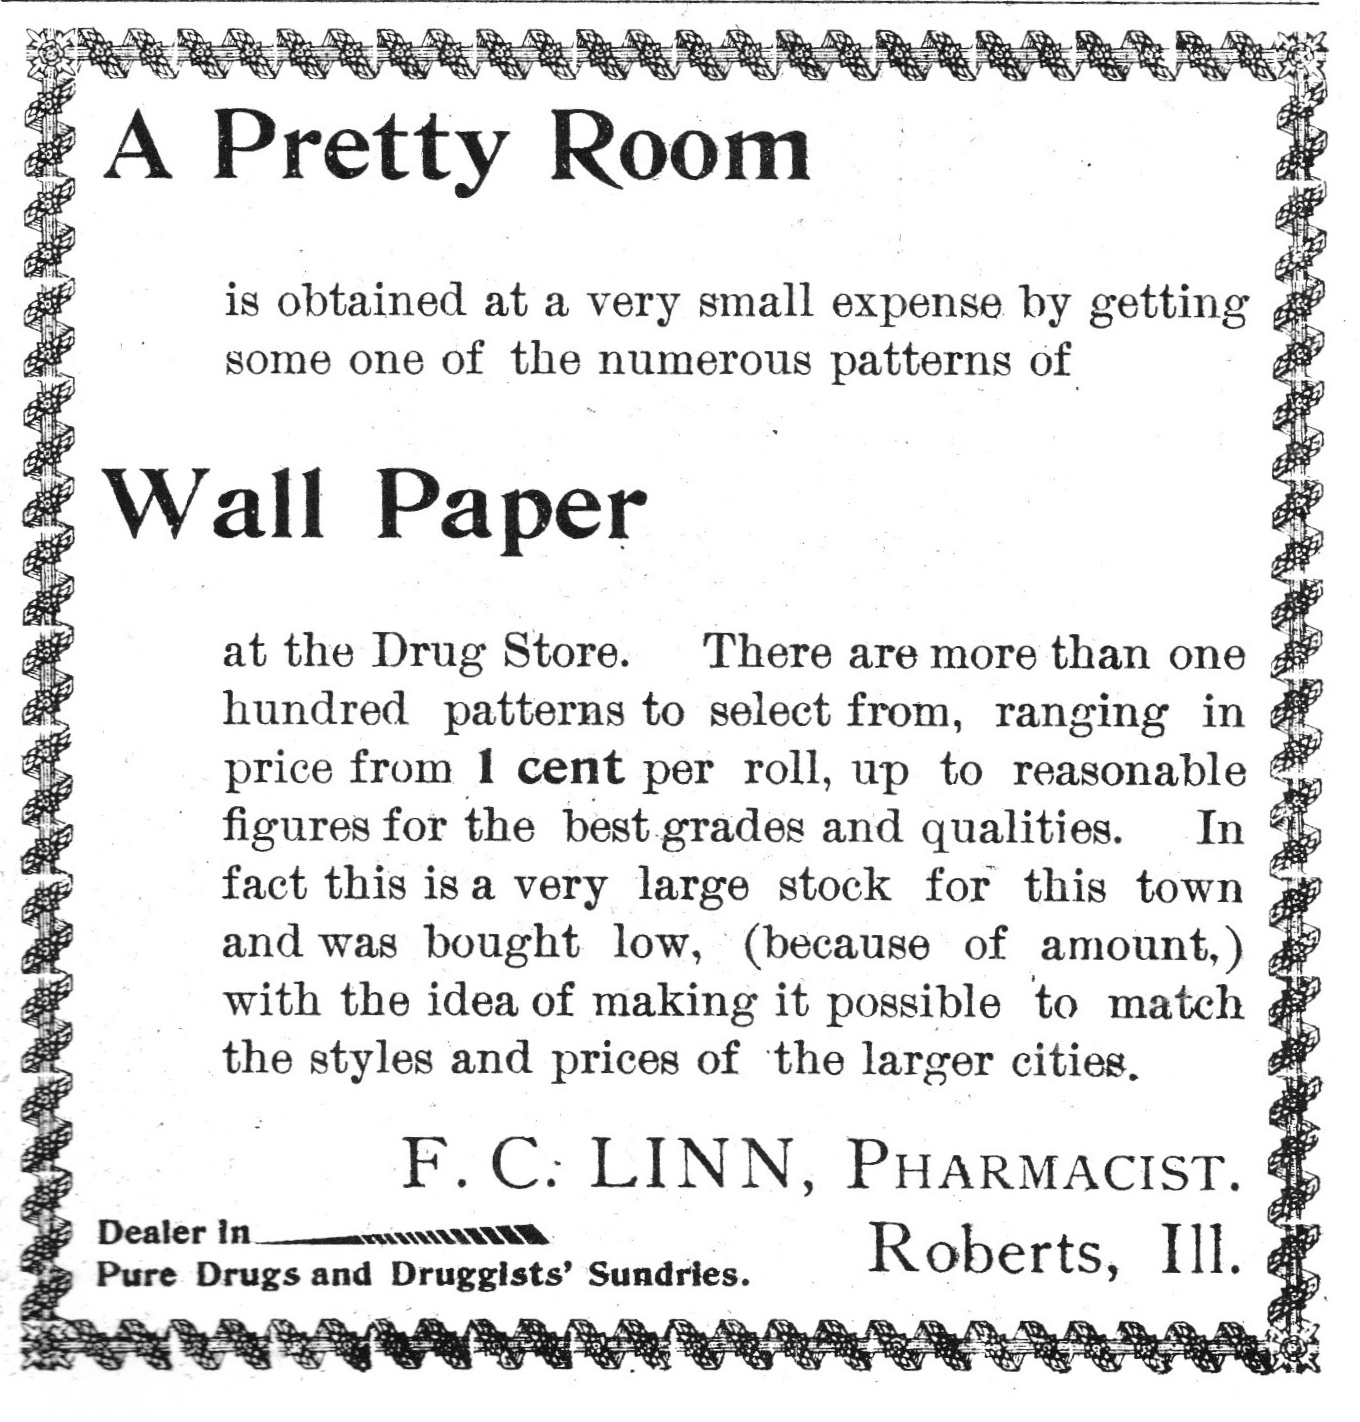 F. C. Linn 1901 Ad